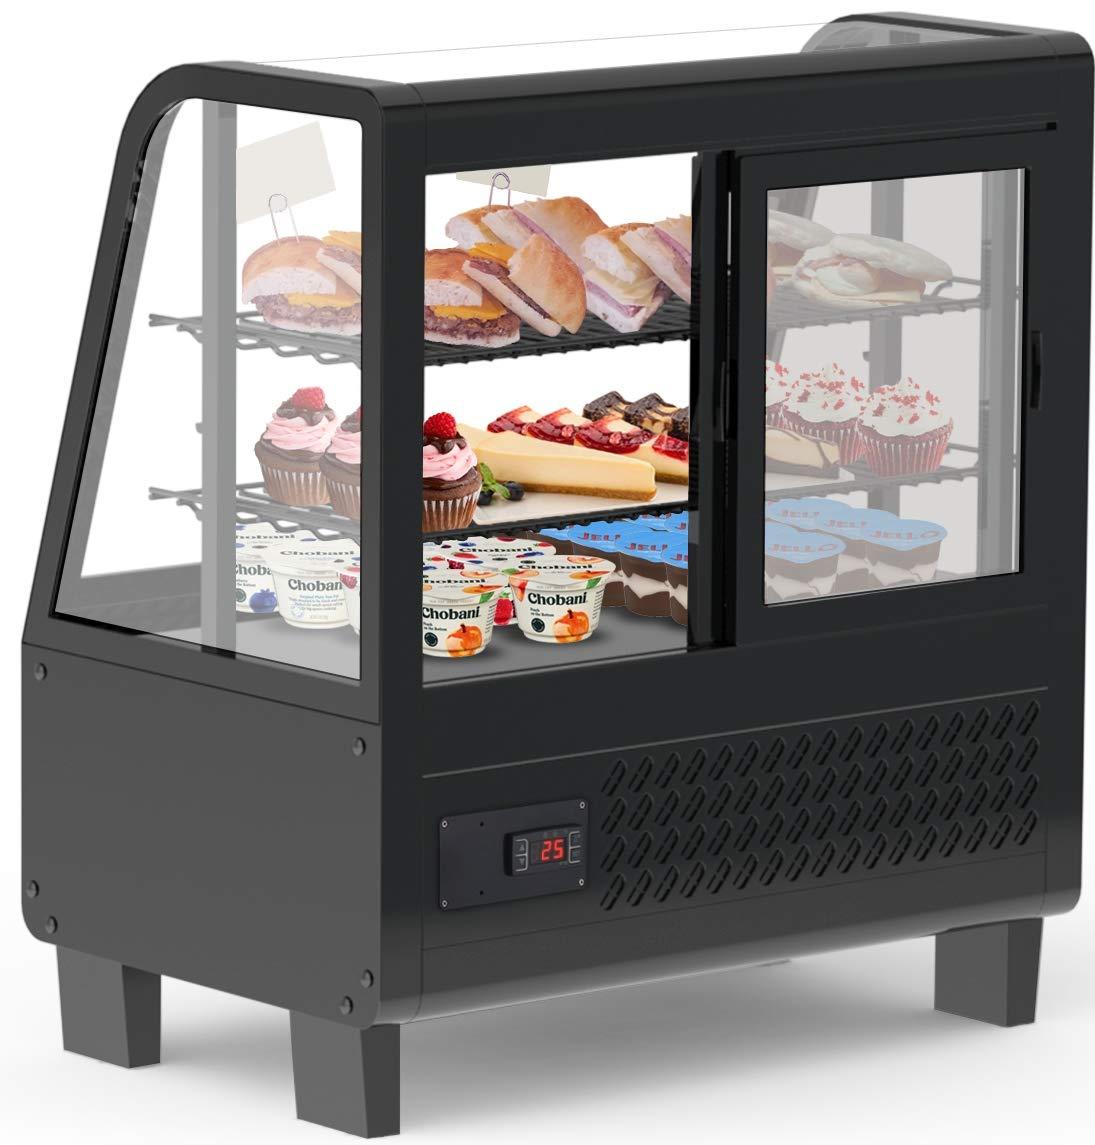 KoolMore Commercial Countertop Refrigerator Display Case Merchandiser with LED Lighting – 3.6 cu. ft, Black (CDC-3C-BK)